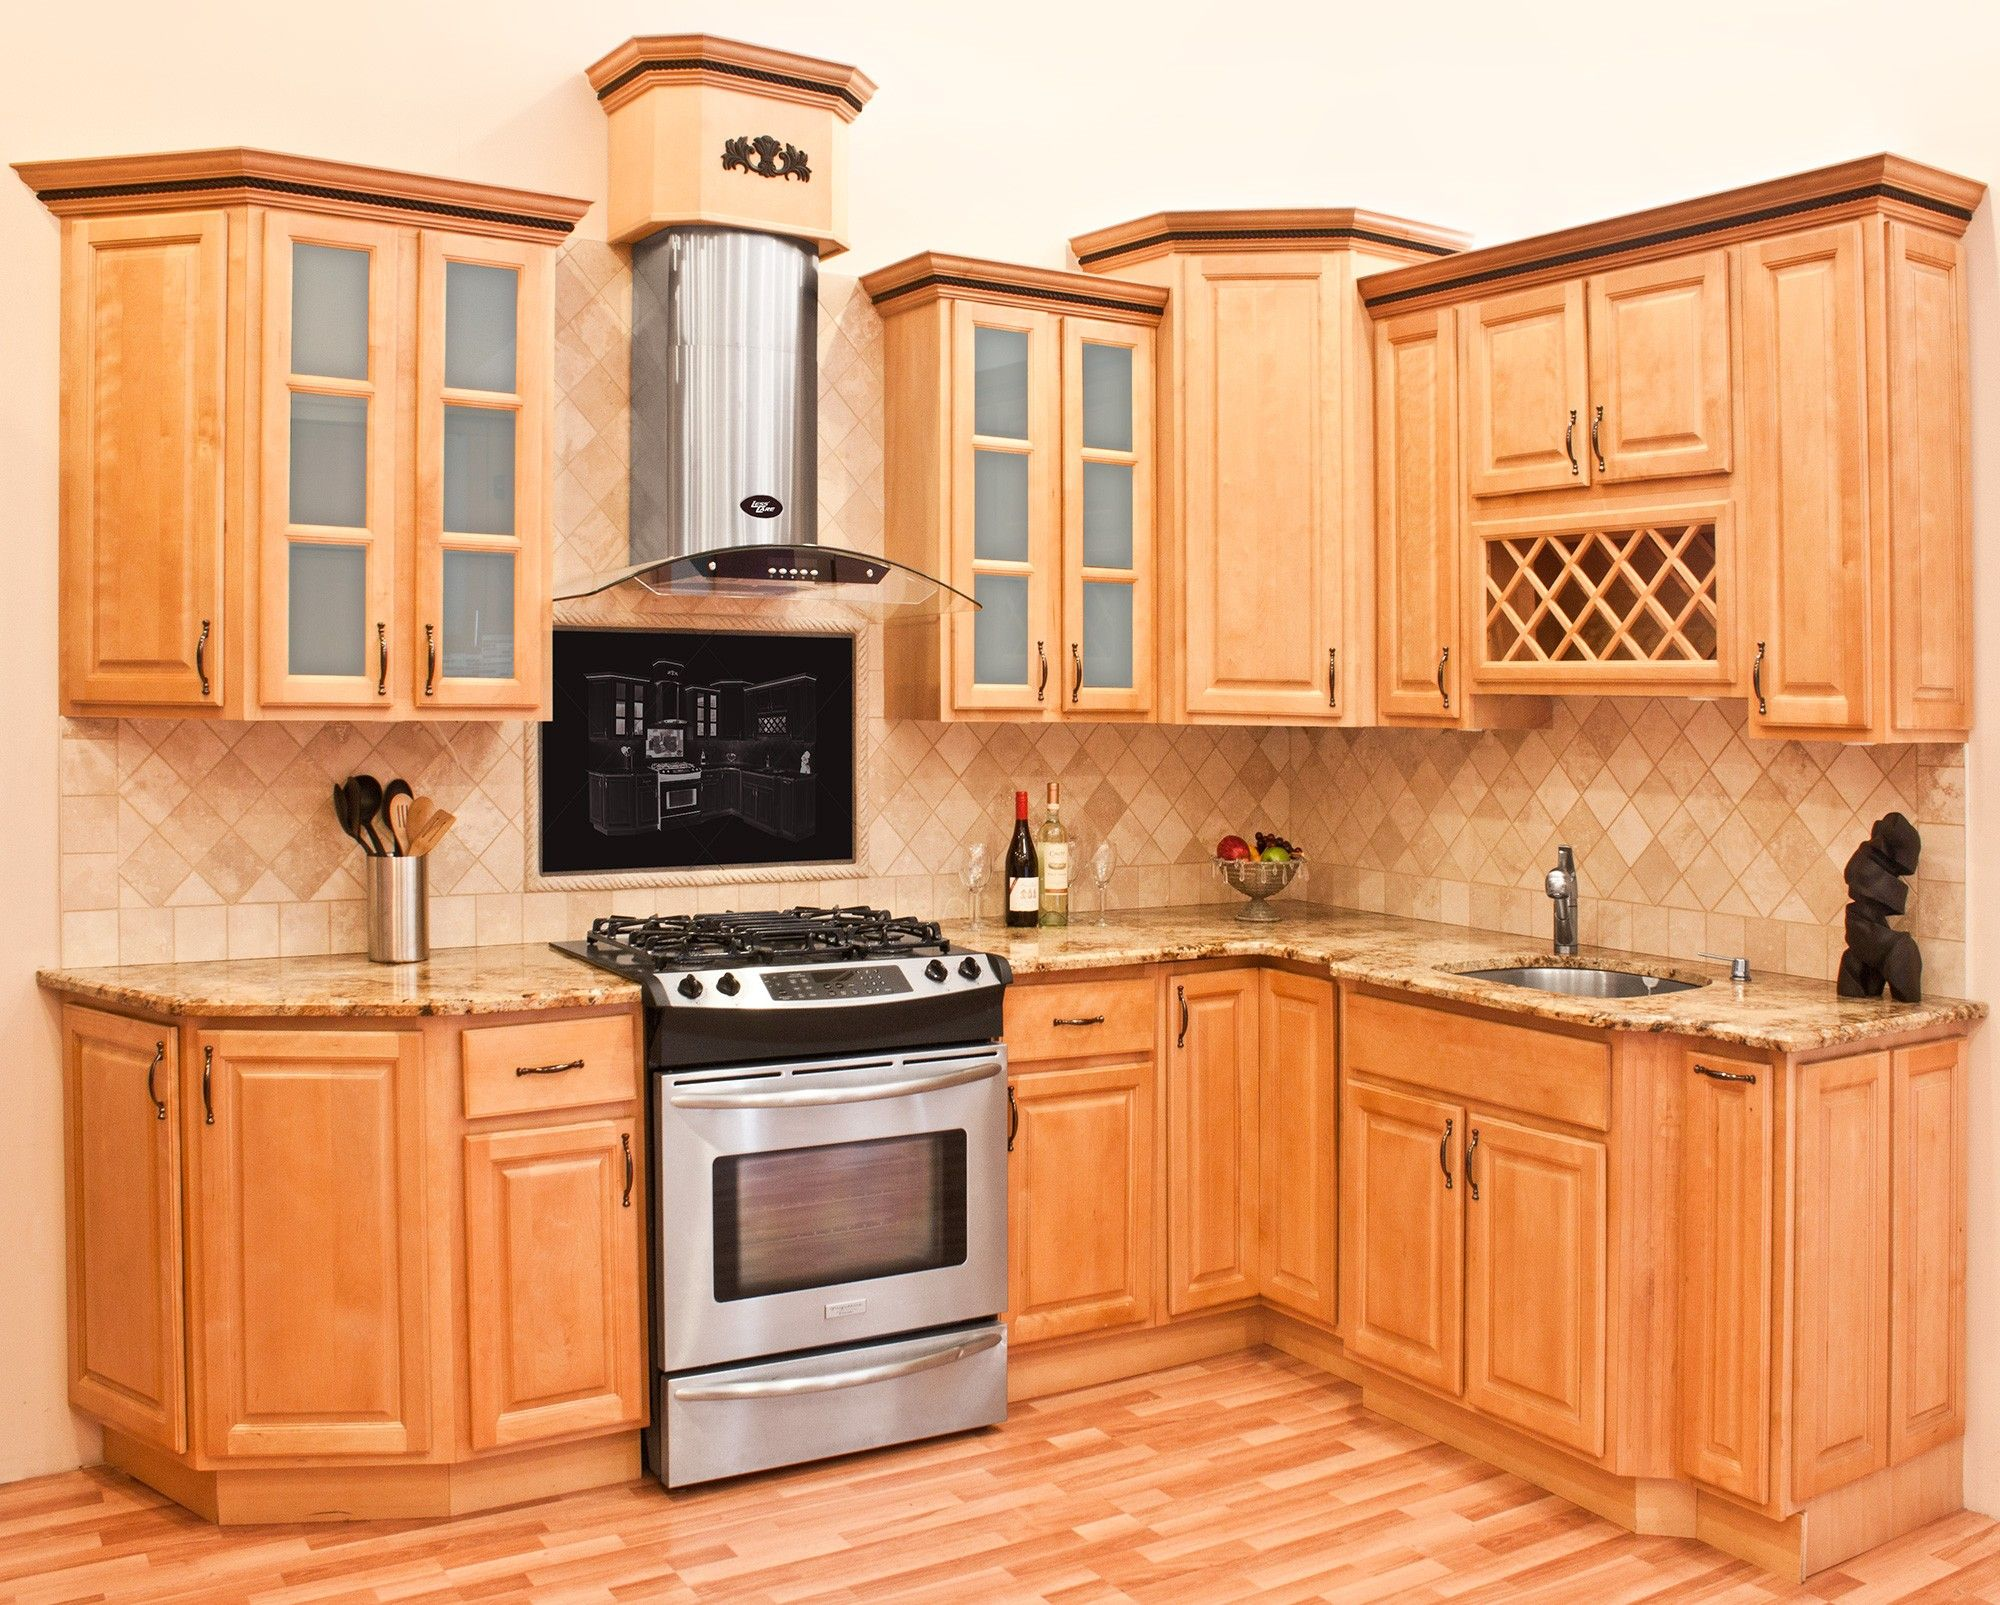 Image Result For Maple Cabinets Quartz Countertops Kitchen Ideas